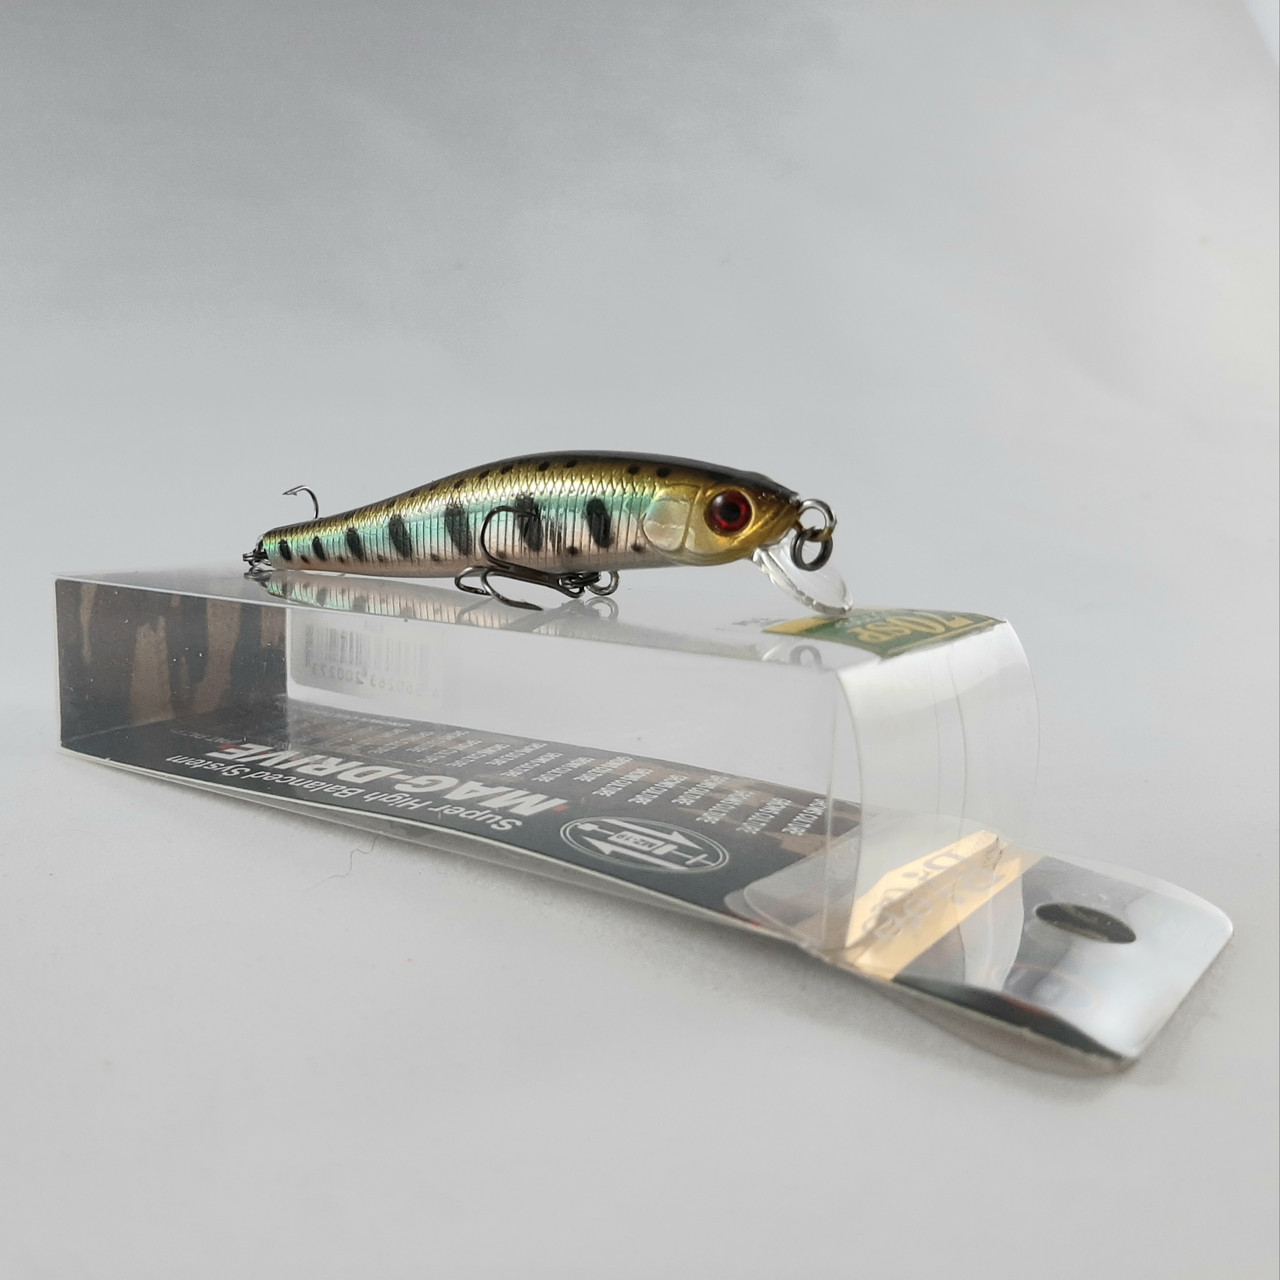 Воблер Grows Culture Rige 70 mm реплика Zip Baits  Rigge 70 mm 5.5 грамм